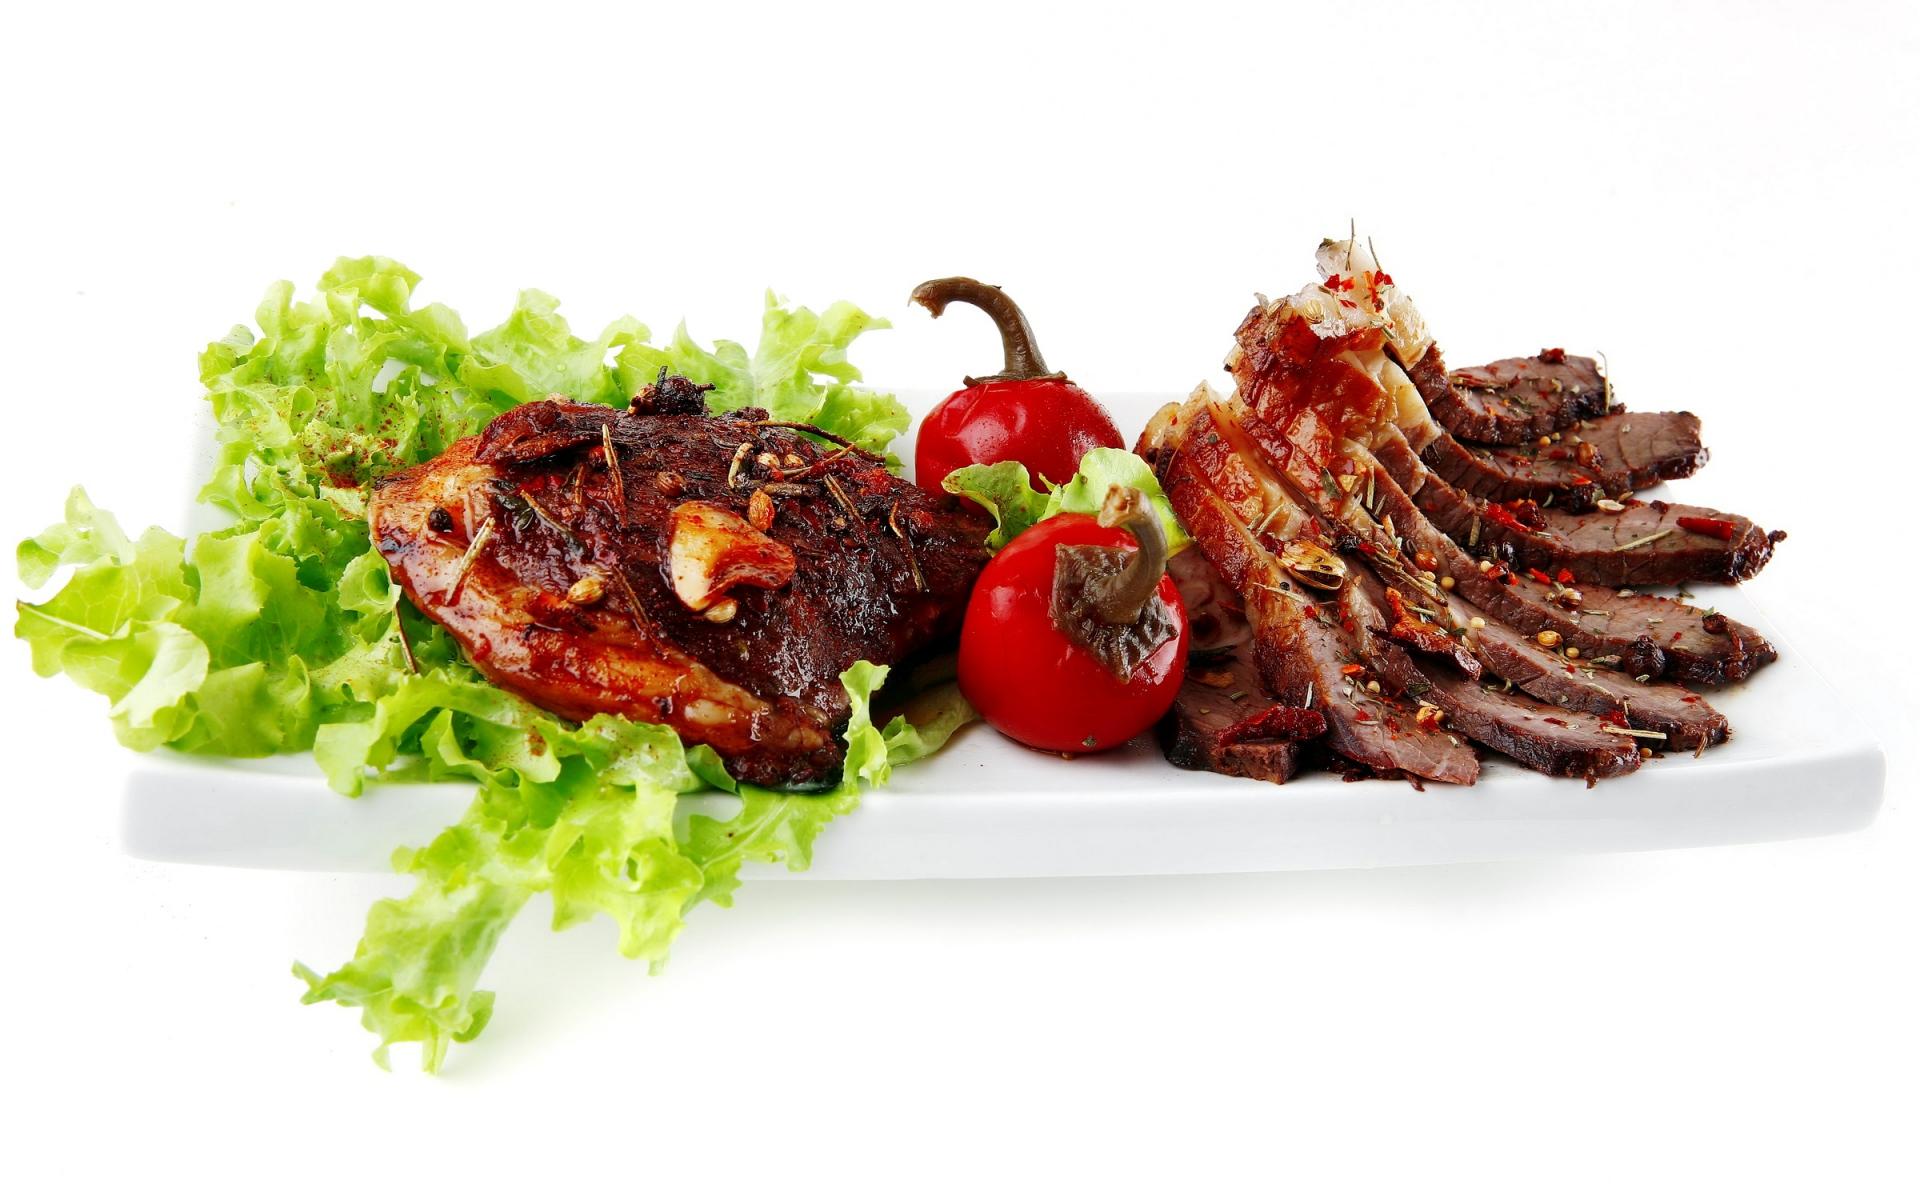 Картинки Мясо, гриль, зелень, овощи фото и обои на рабочий стол